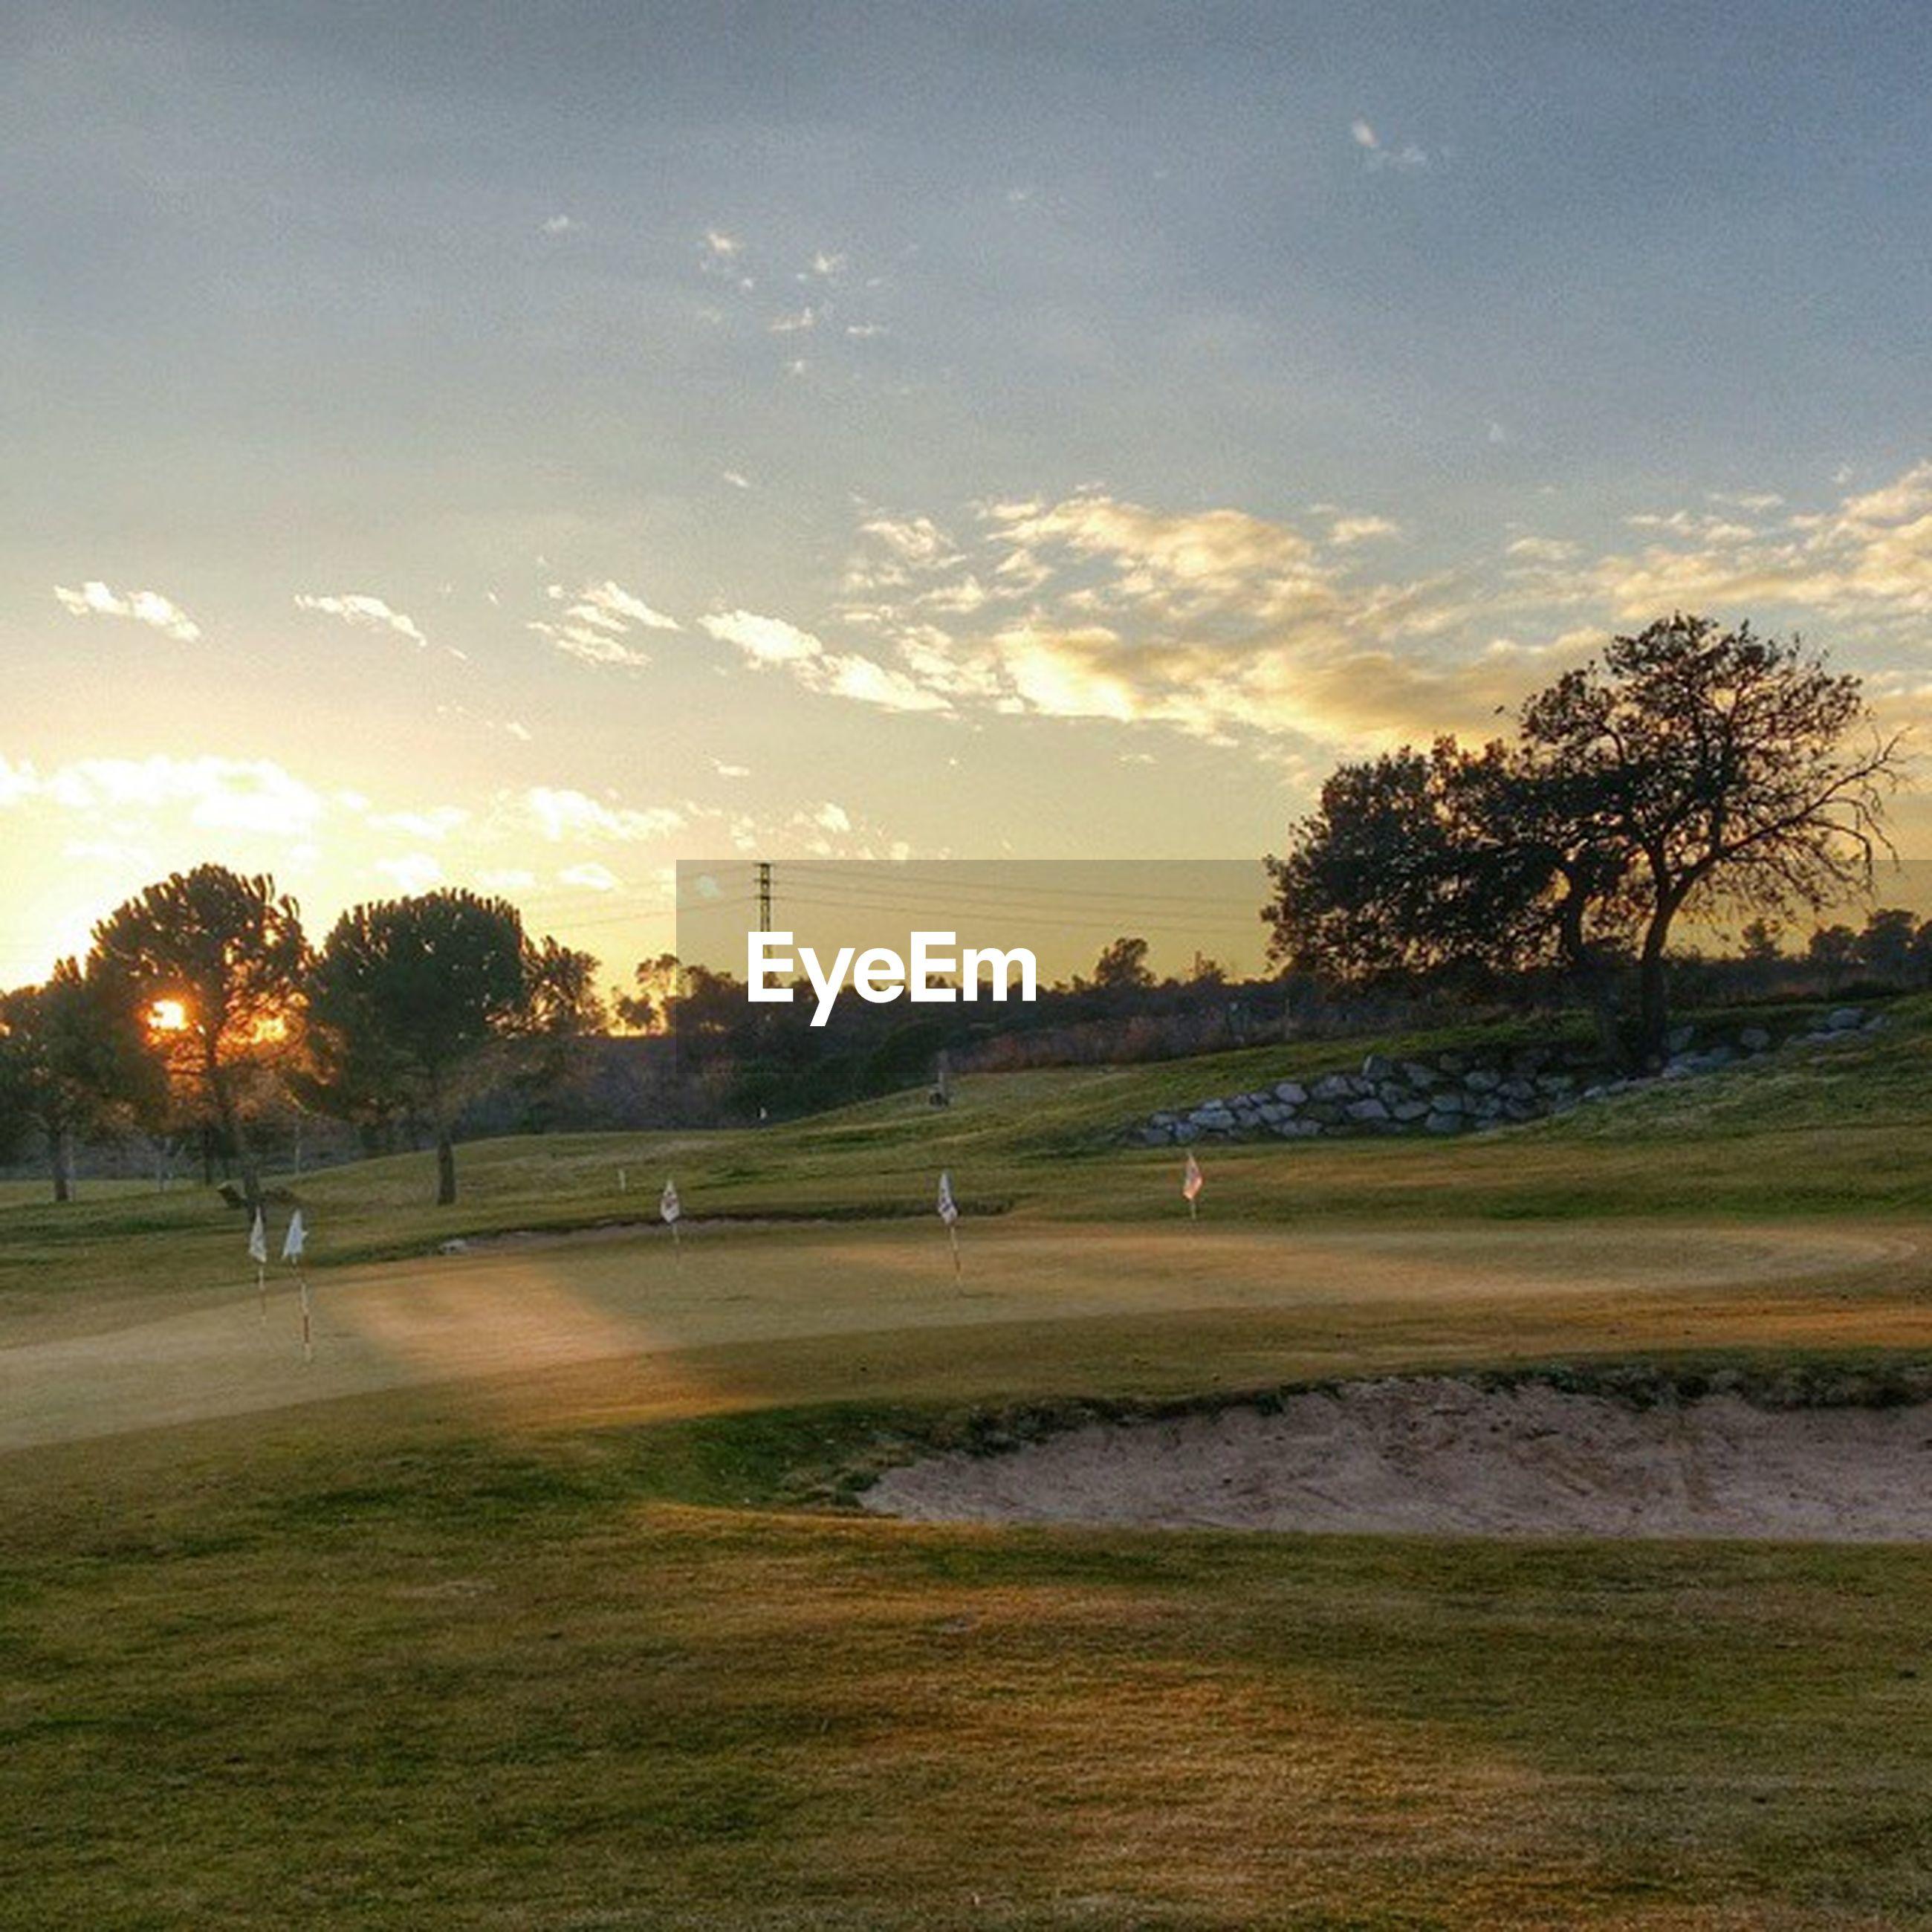 sunset, tree, sky, tranquil scene, landscape, tranquility, grass, field, scenics, sun, beauty in nature, nature, cloud - sky, sunlight, grassy, orange color, idyllic, silhouette, growth, non-urban scene